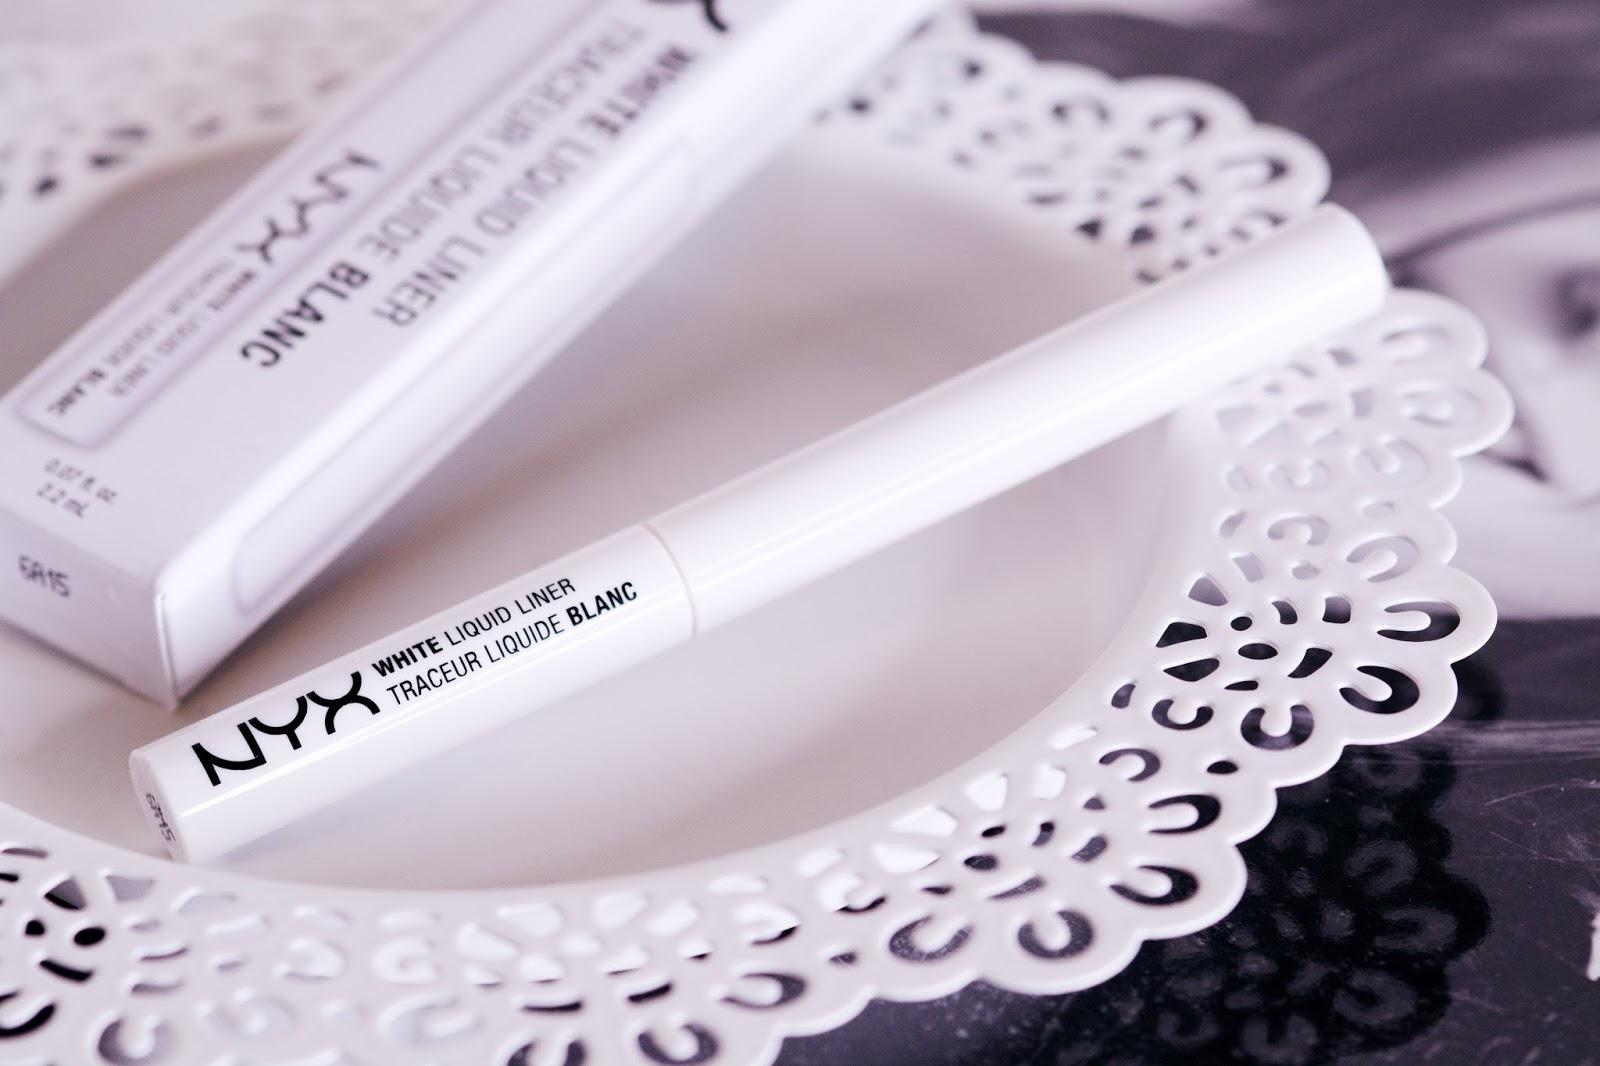 NYX Liquid linere White